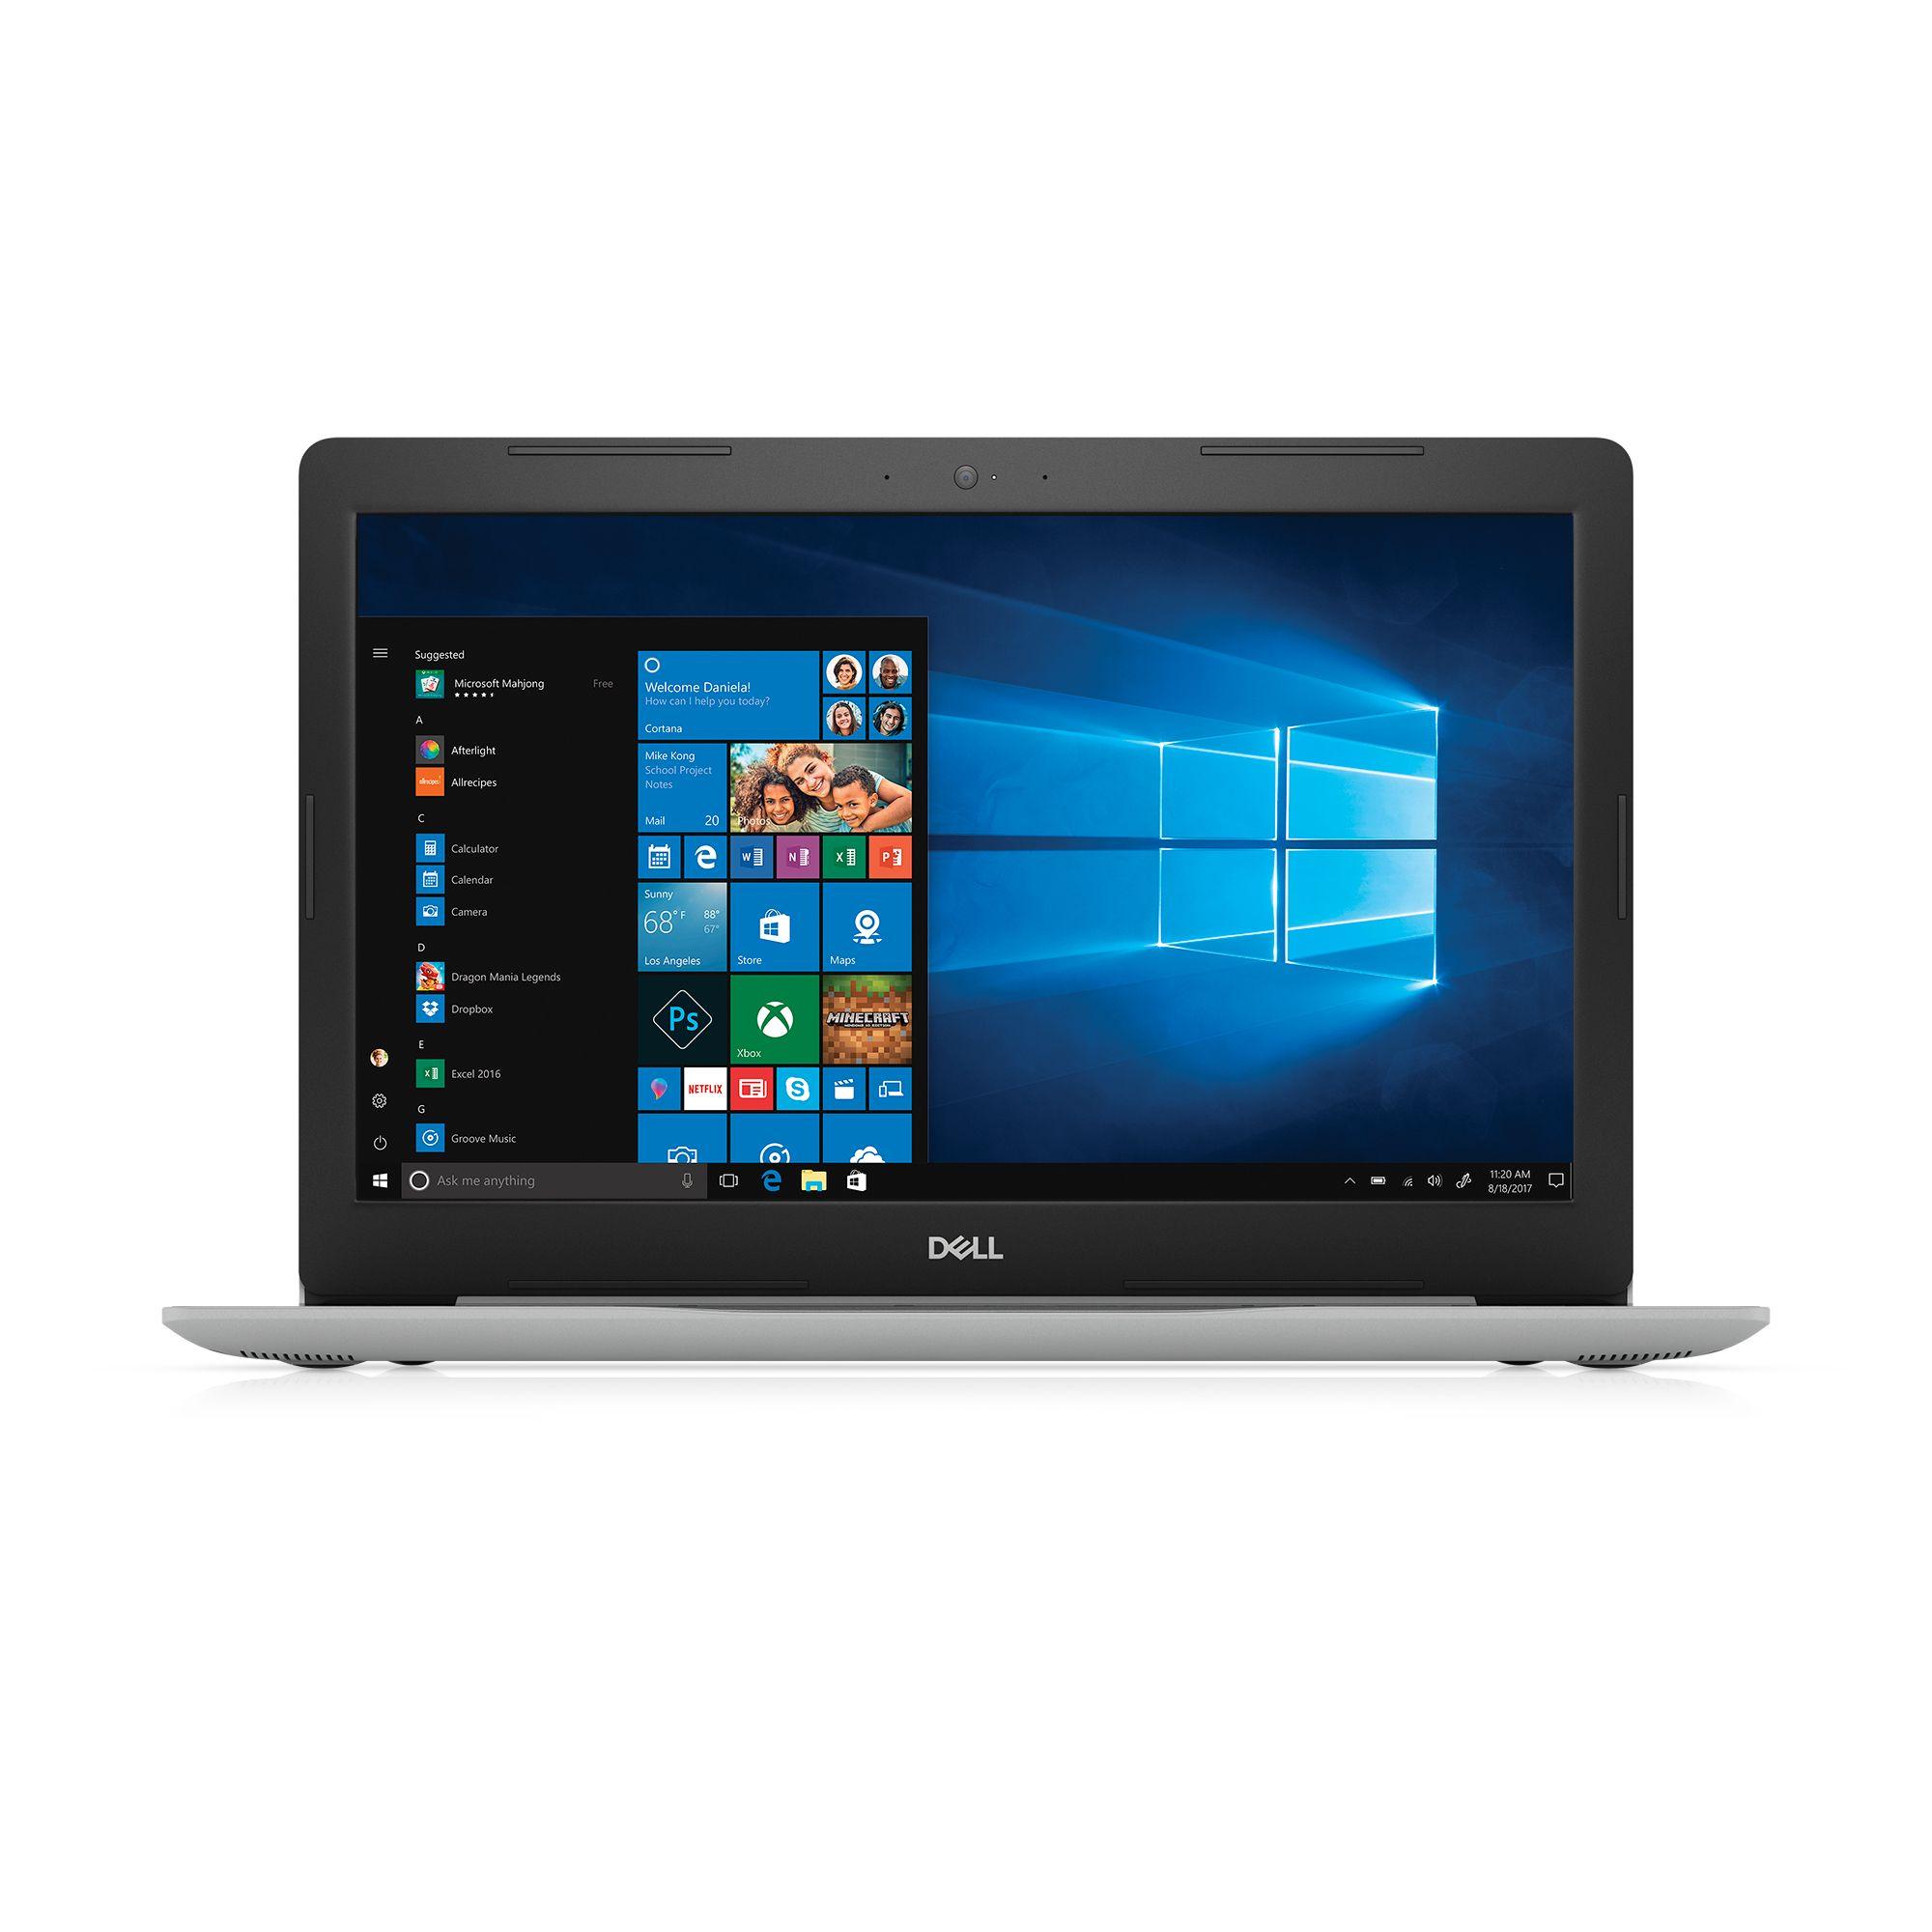 "Dell Inspiron 15 5570 Series 15.6"" HD Laptop (Core i7"